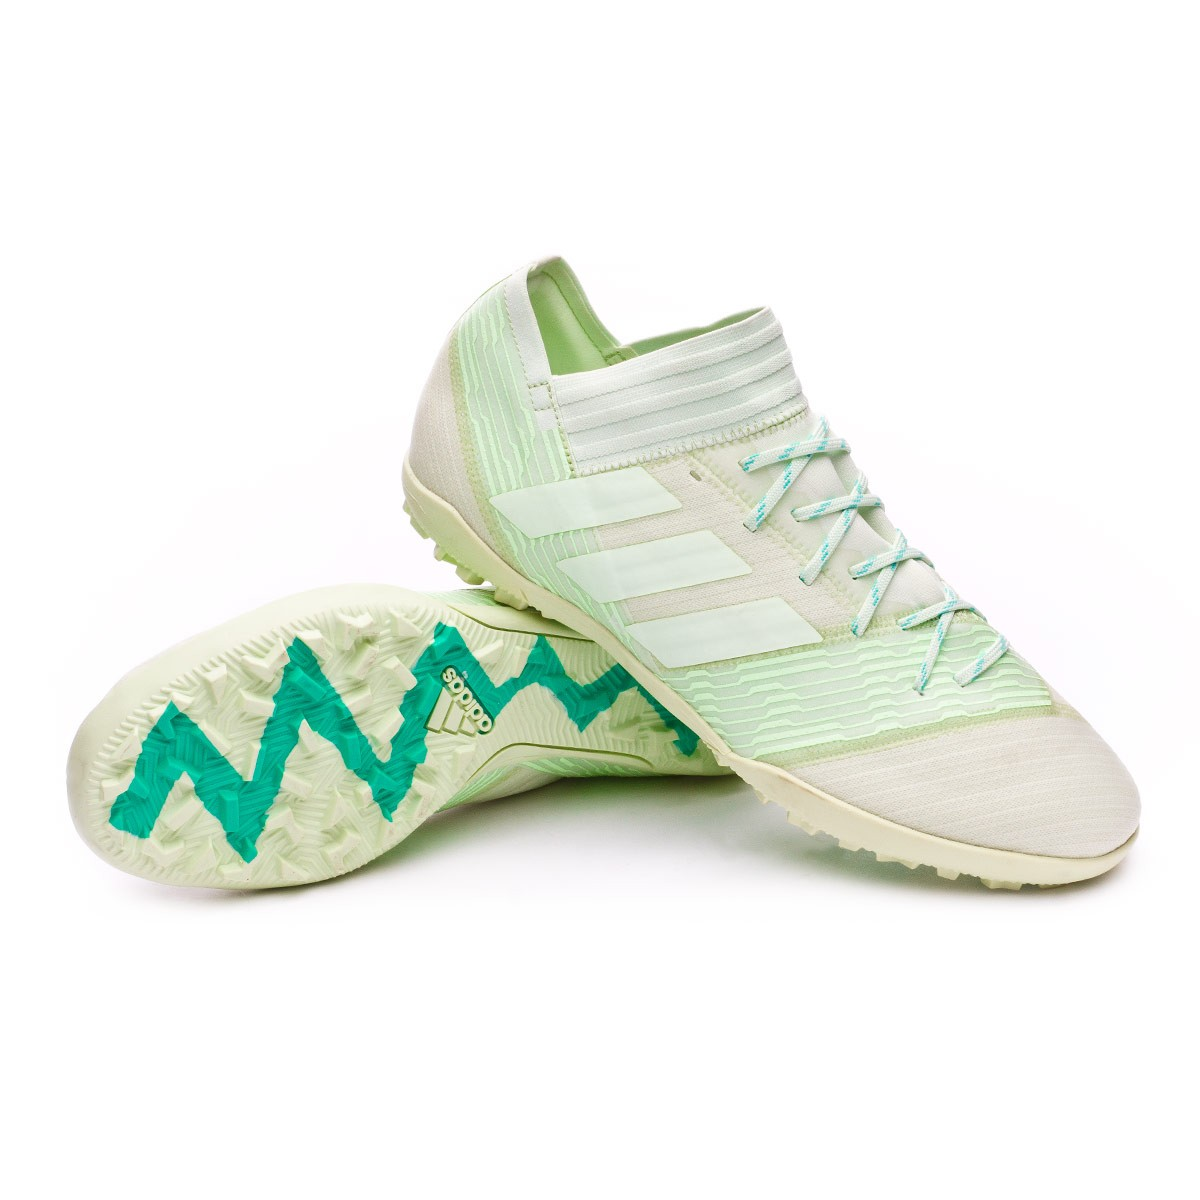 76af86752 Football Boot adidas Nemeziz Tango 17.3 Turf Aero green-Hi-res green -  Football store Fútbol Emotion